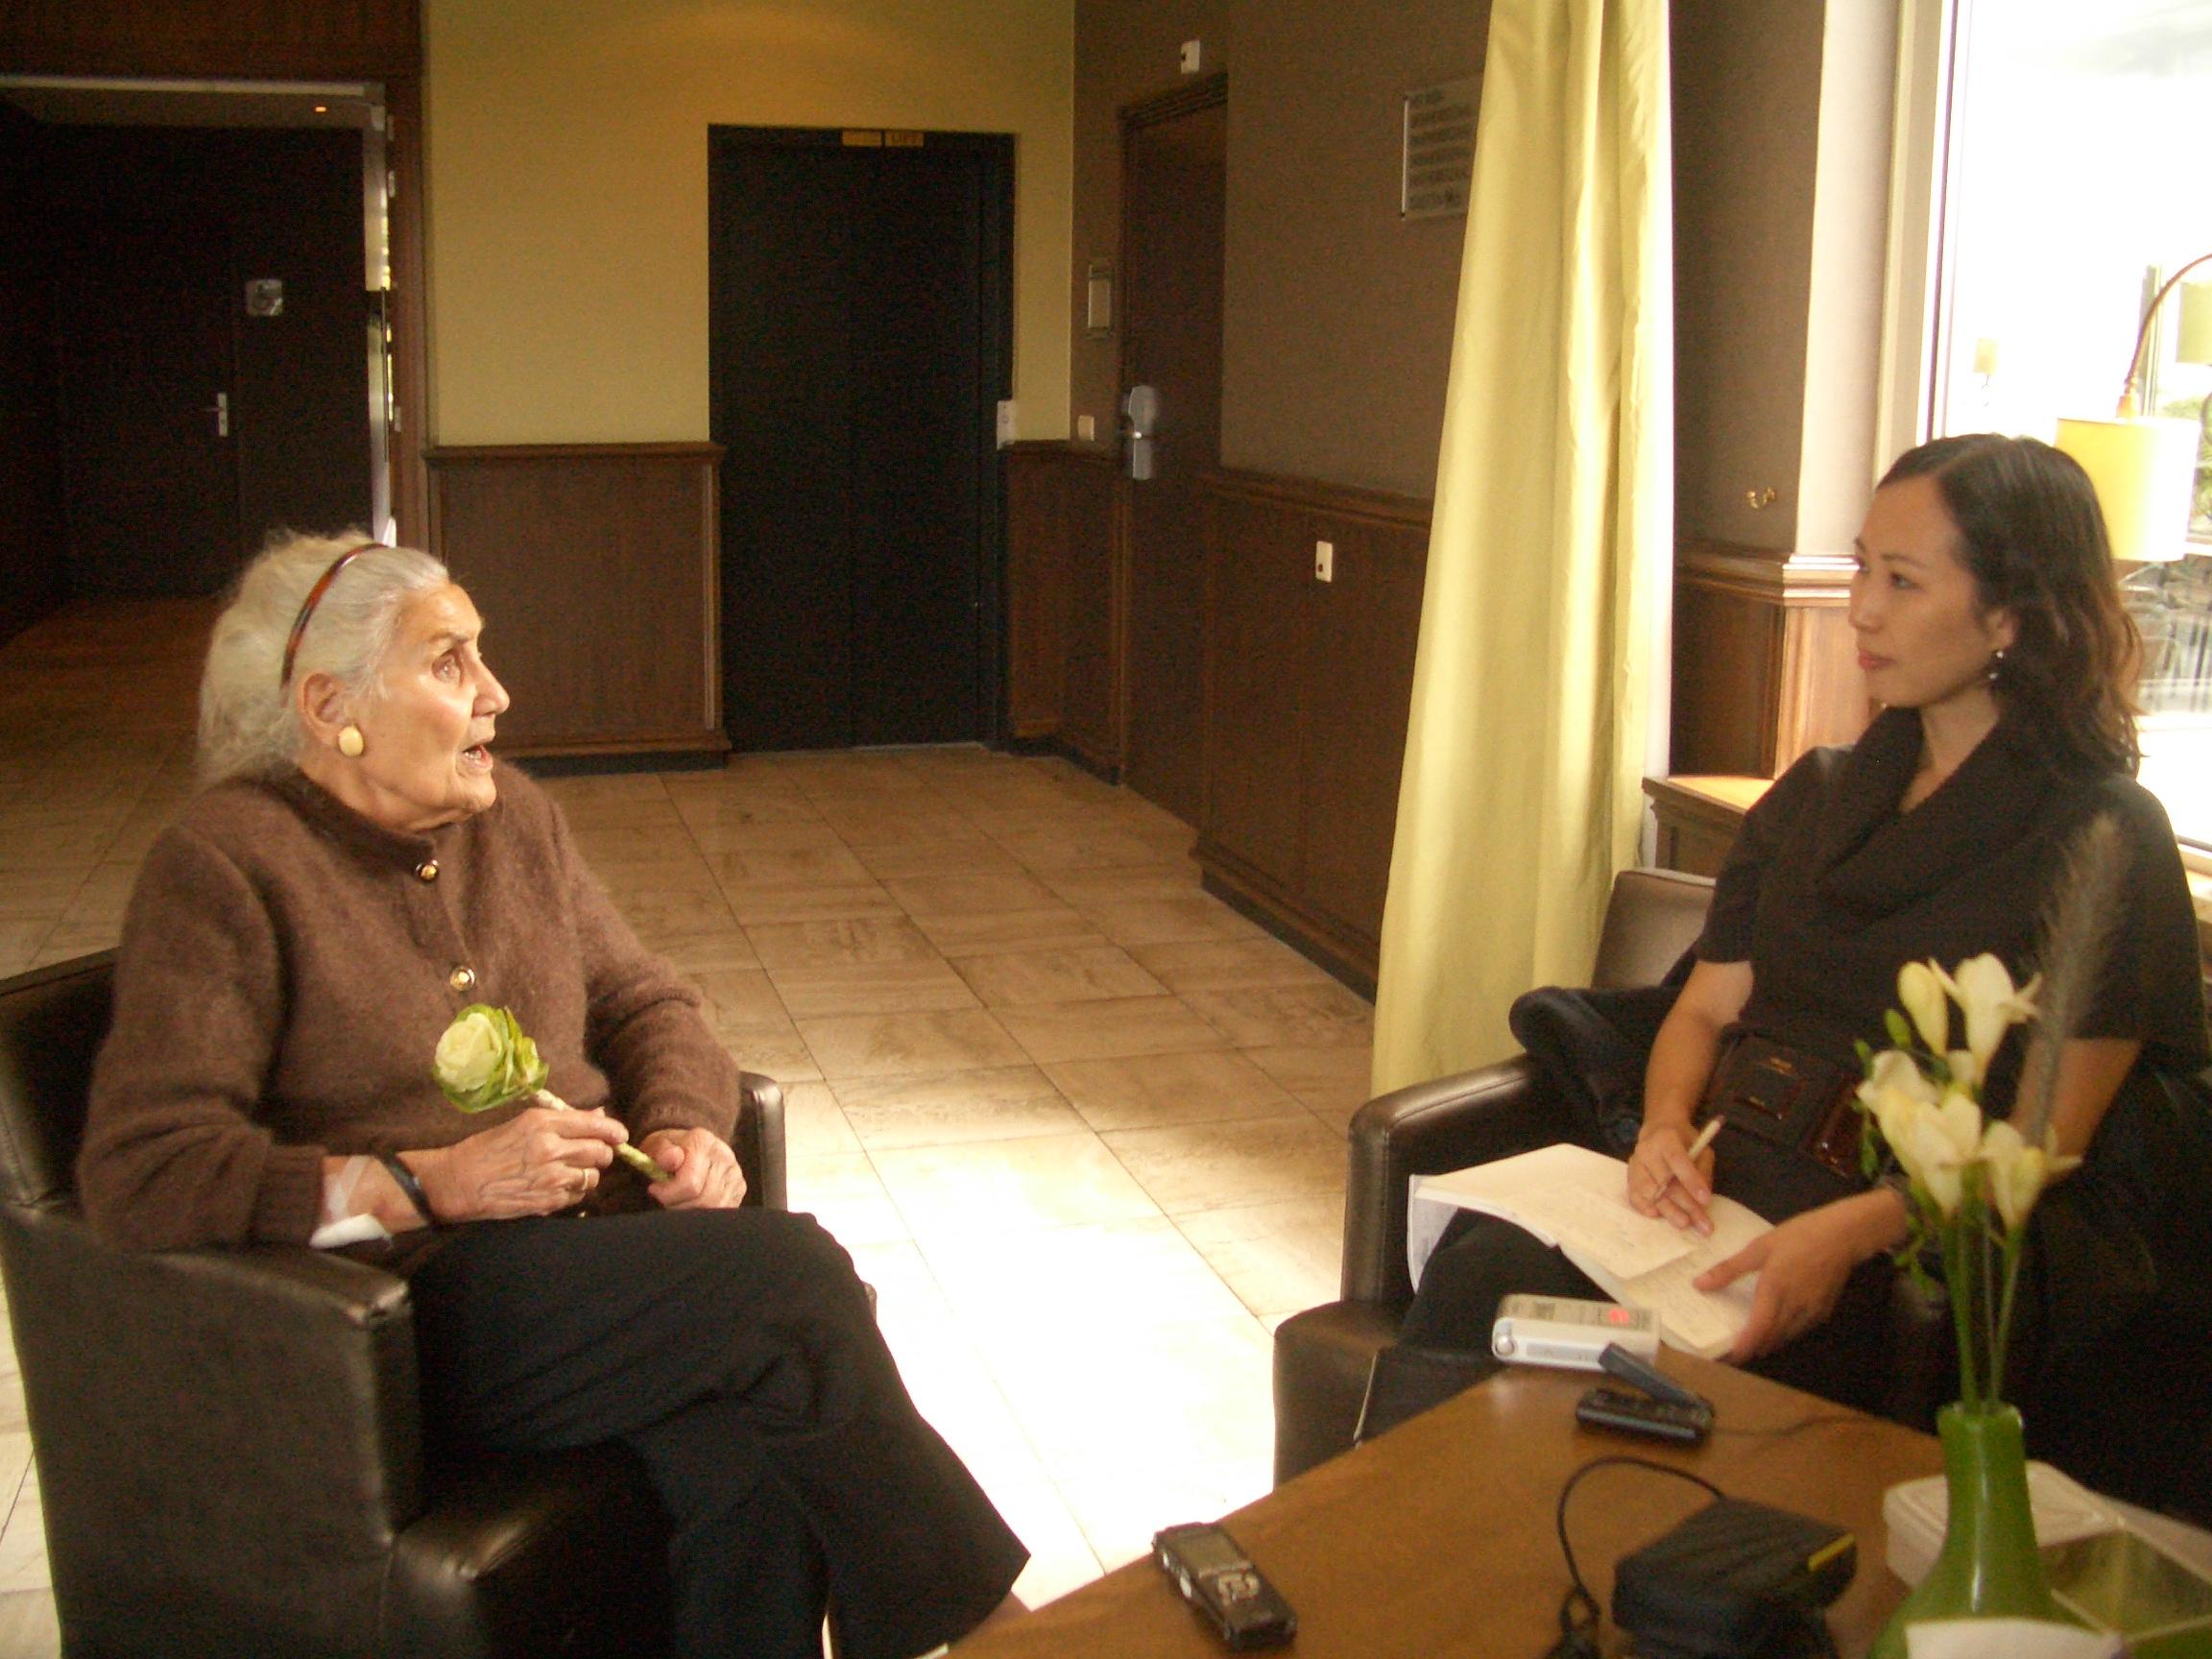 Sylvia Yu (right) interviewing Dutch comfort woman survivor Ellen van der Ploeg (left) for video and print media